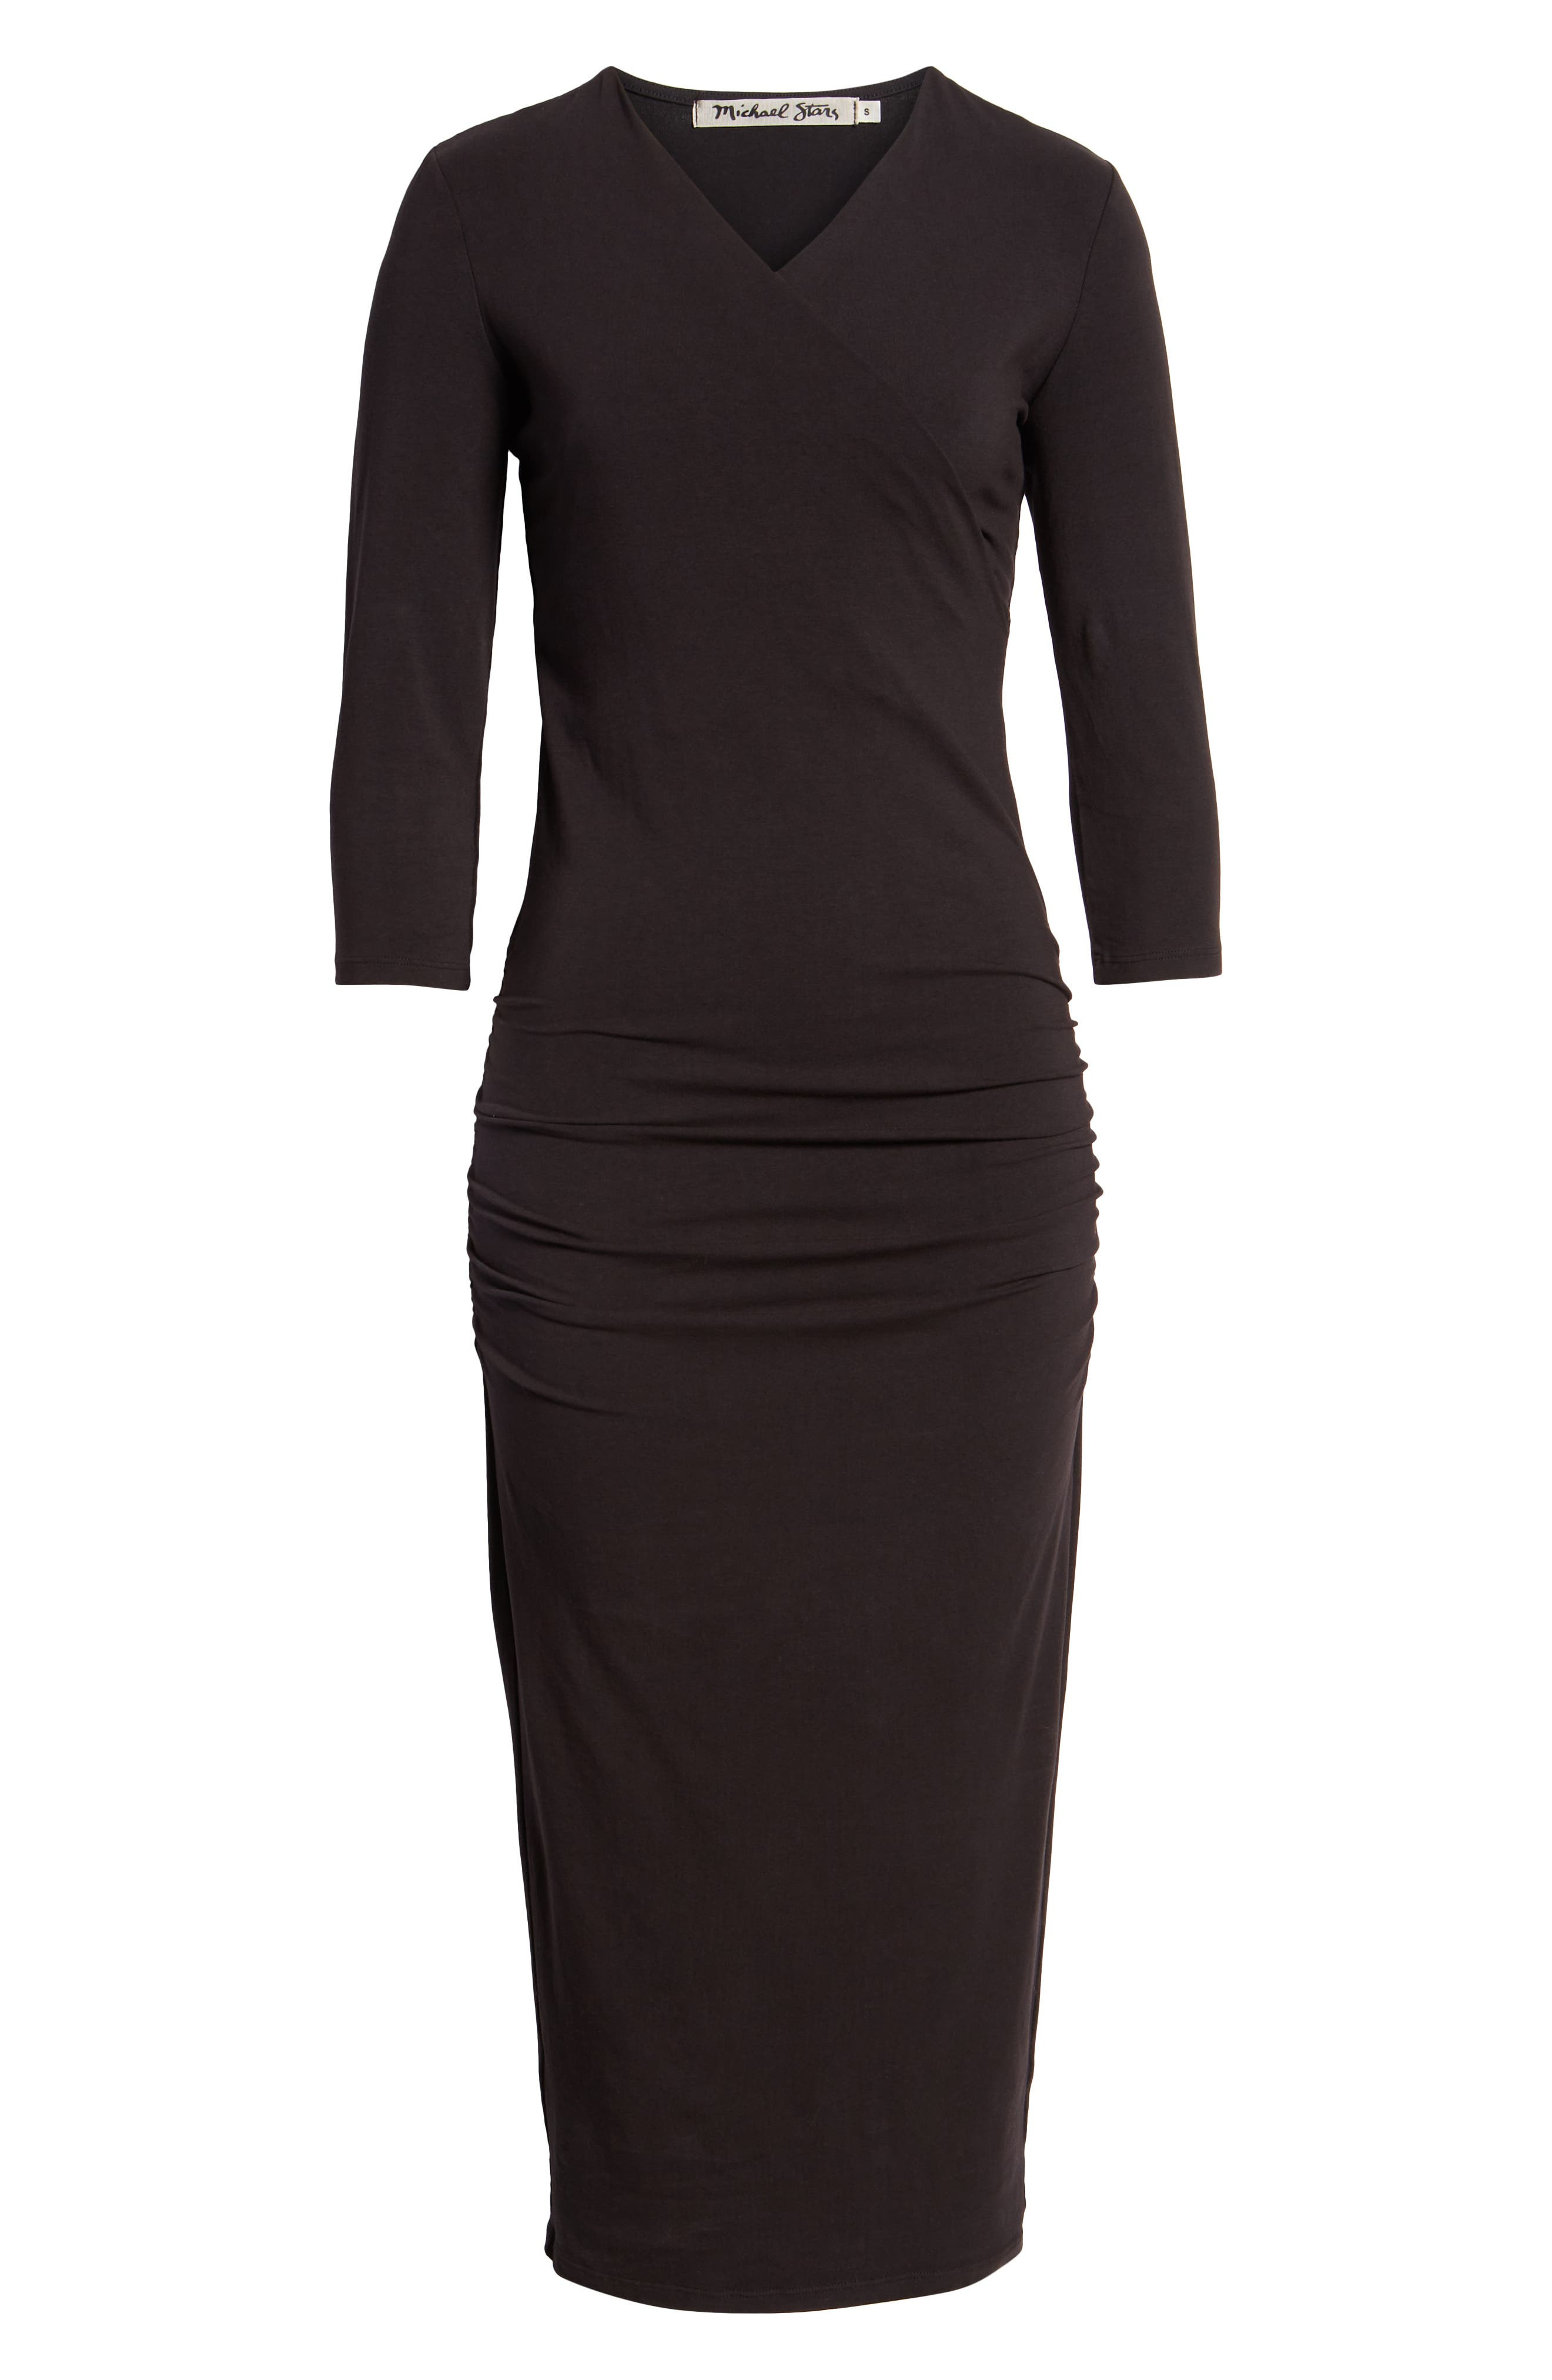 MICHAEL STARS,                             Ruched Surplice Stretch Cotton Body-Con Dress,                             Alternate thumbnail 7, color,                             001